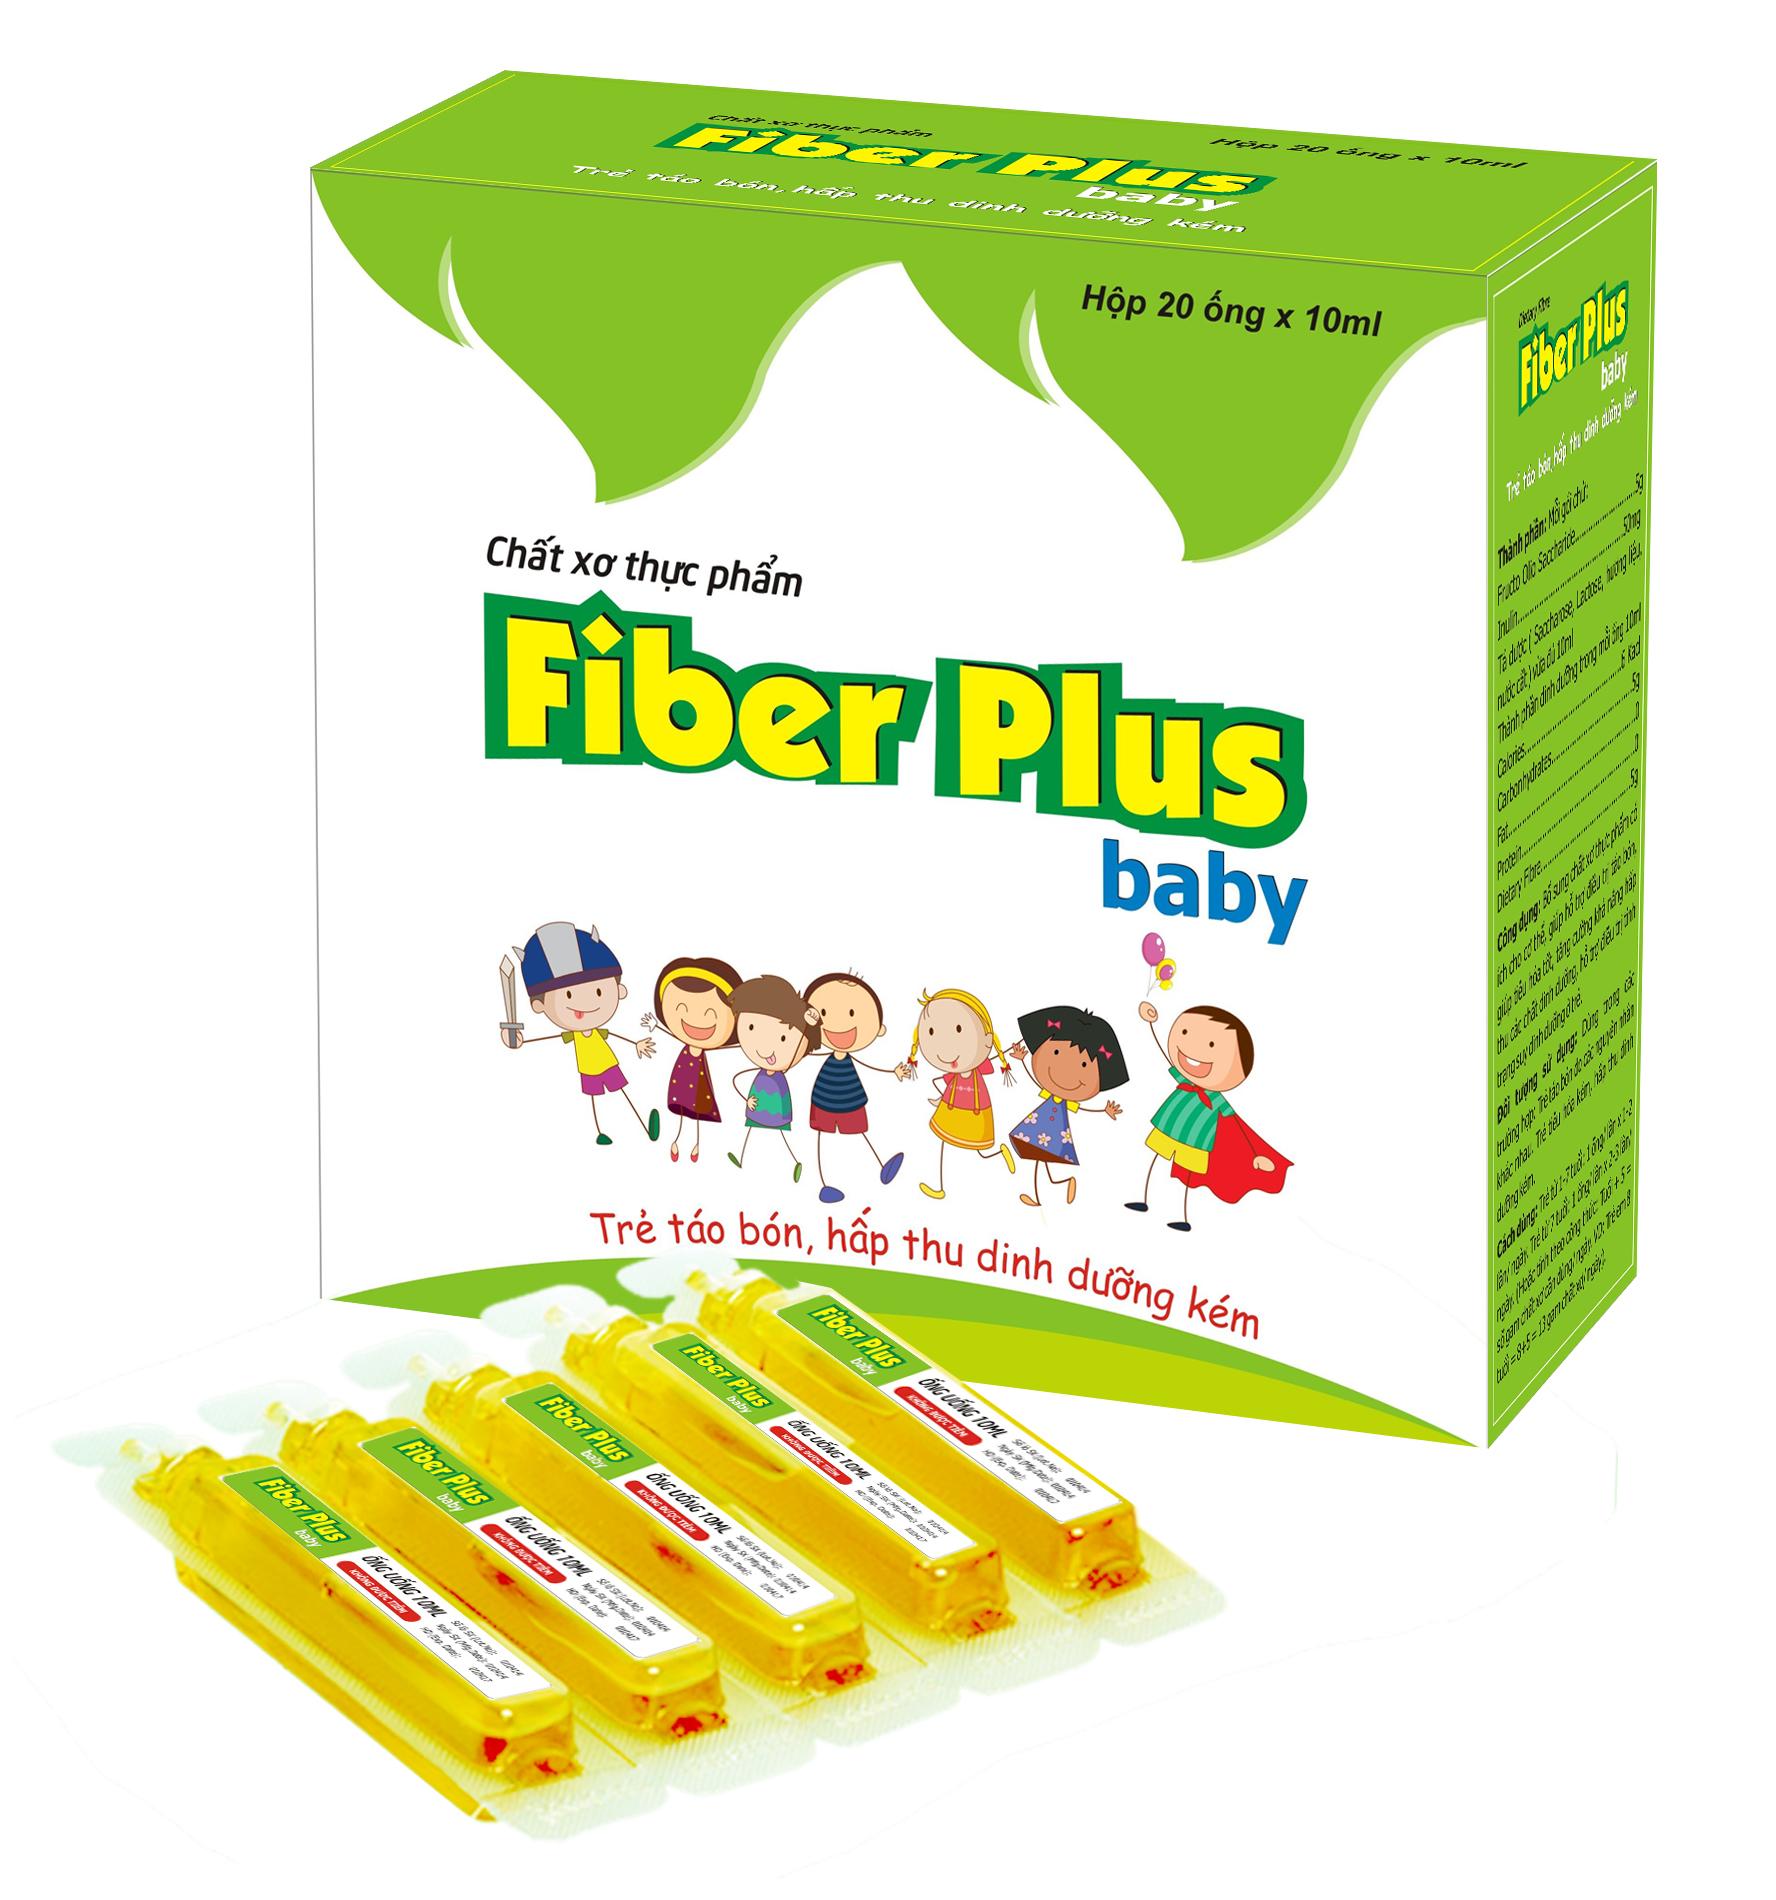 fiber-plus-baby-dieu-tri-tao-bon-cho-tre-so-sinh